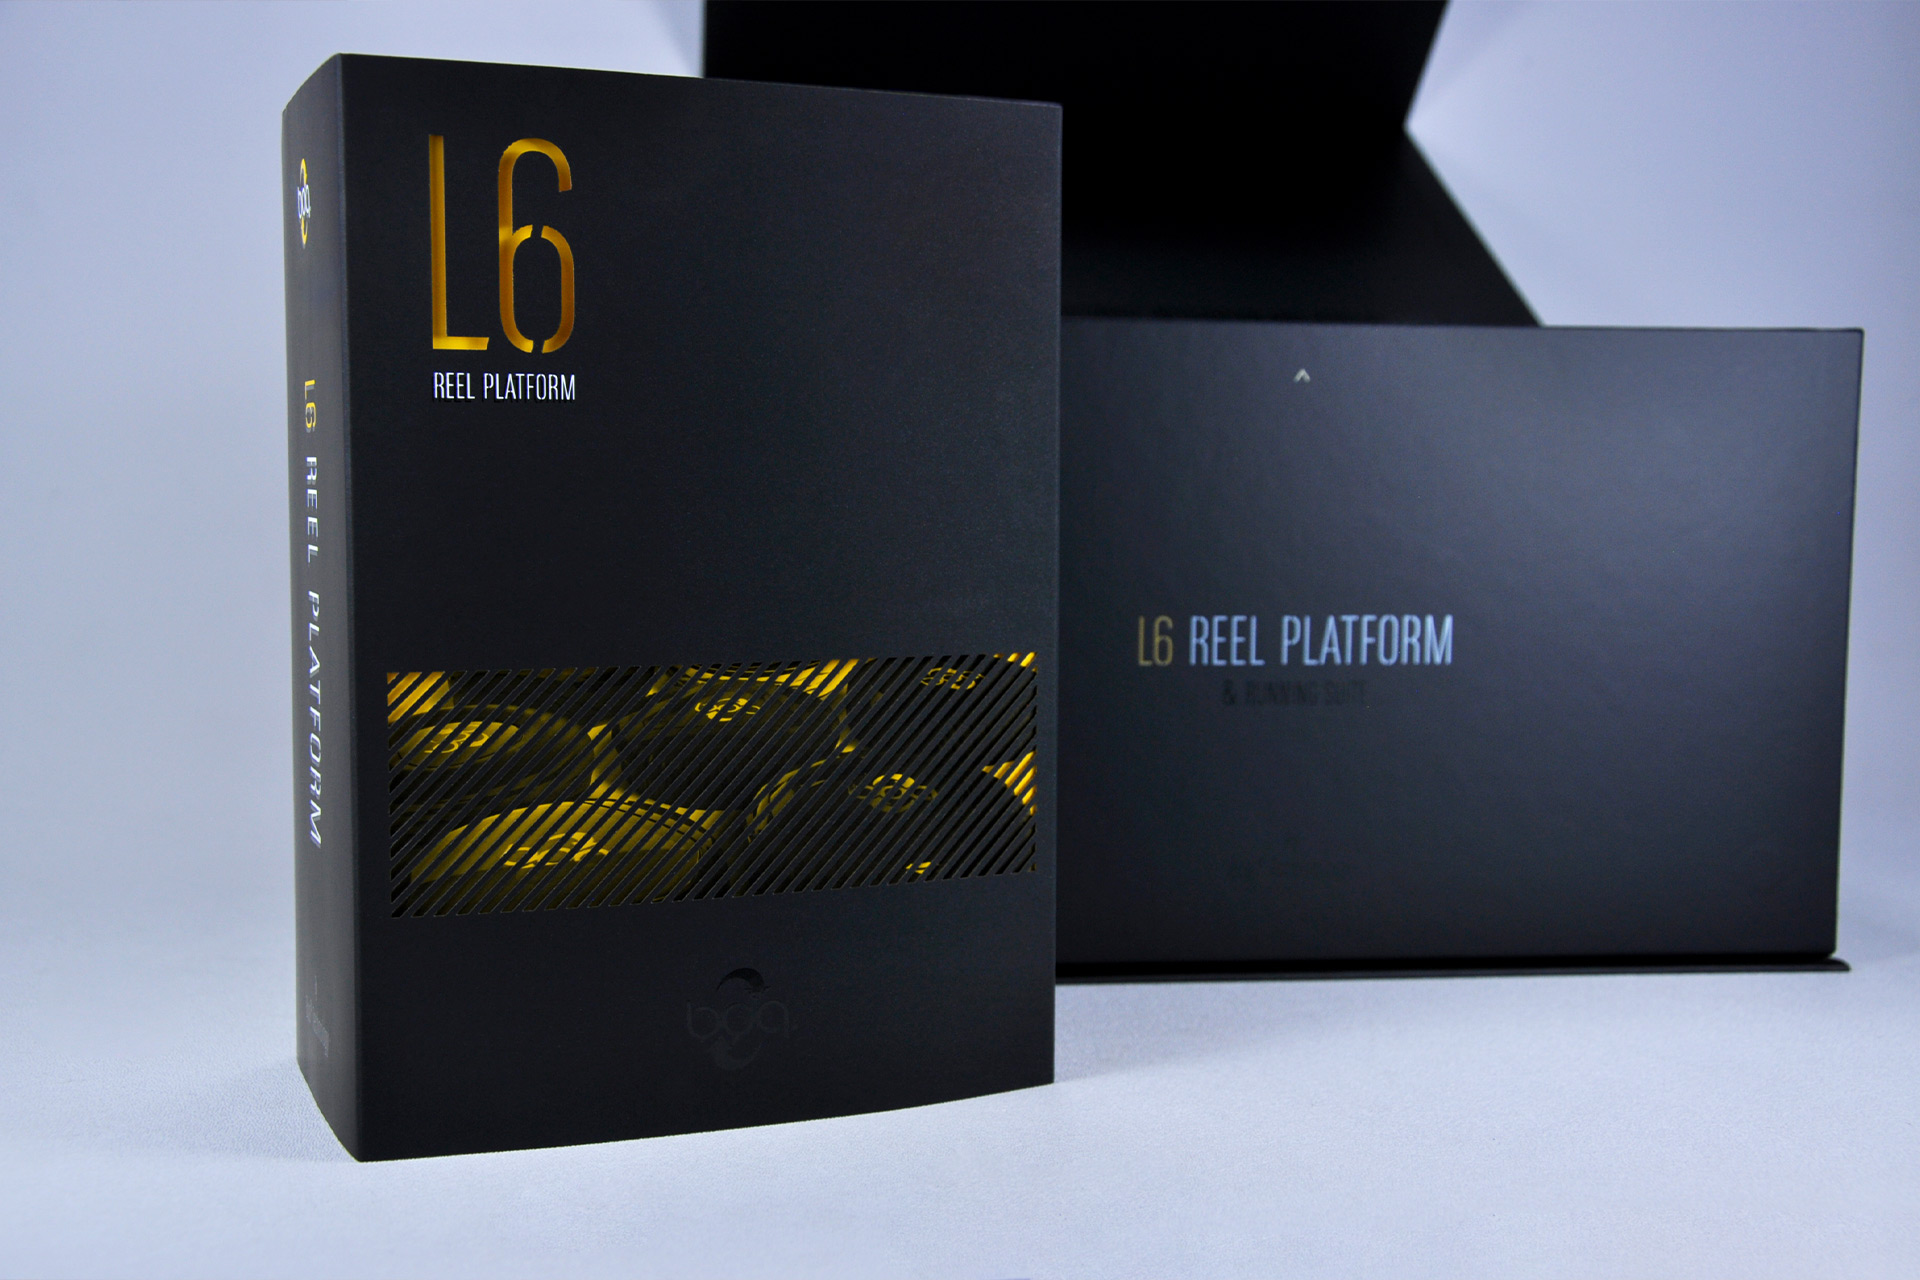 MikeSpencerDesign-L6DialPlatformLaunch-BoxShot-1920×1280-1